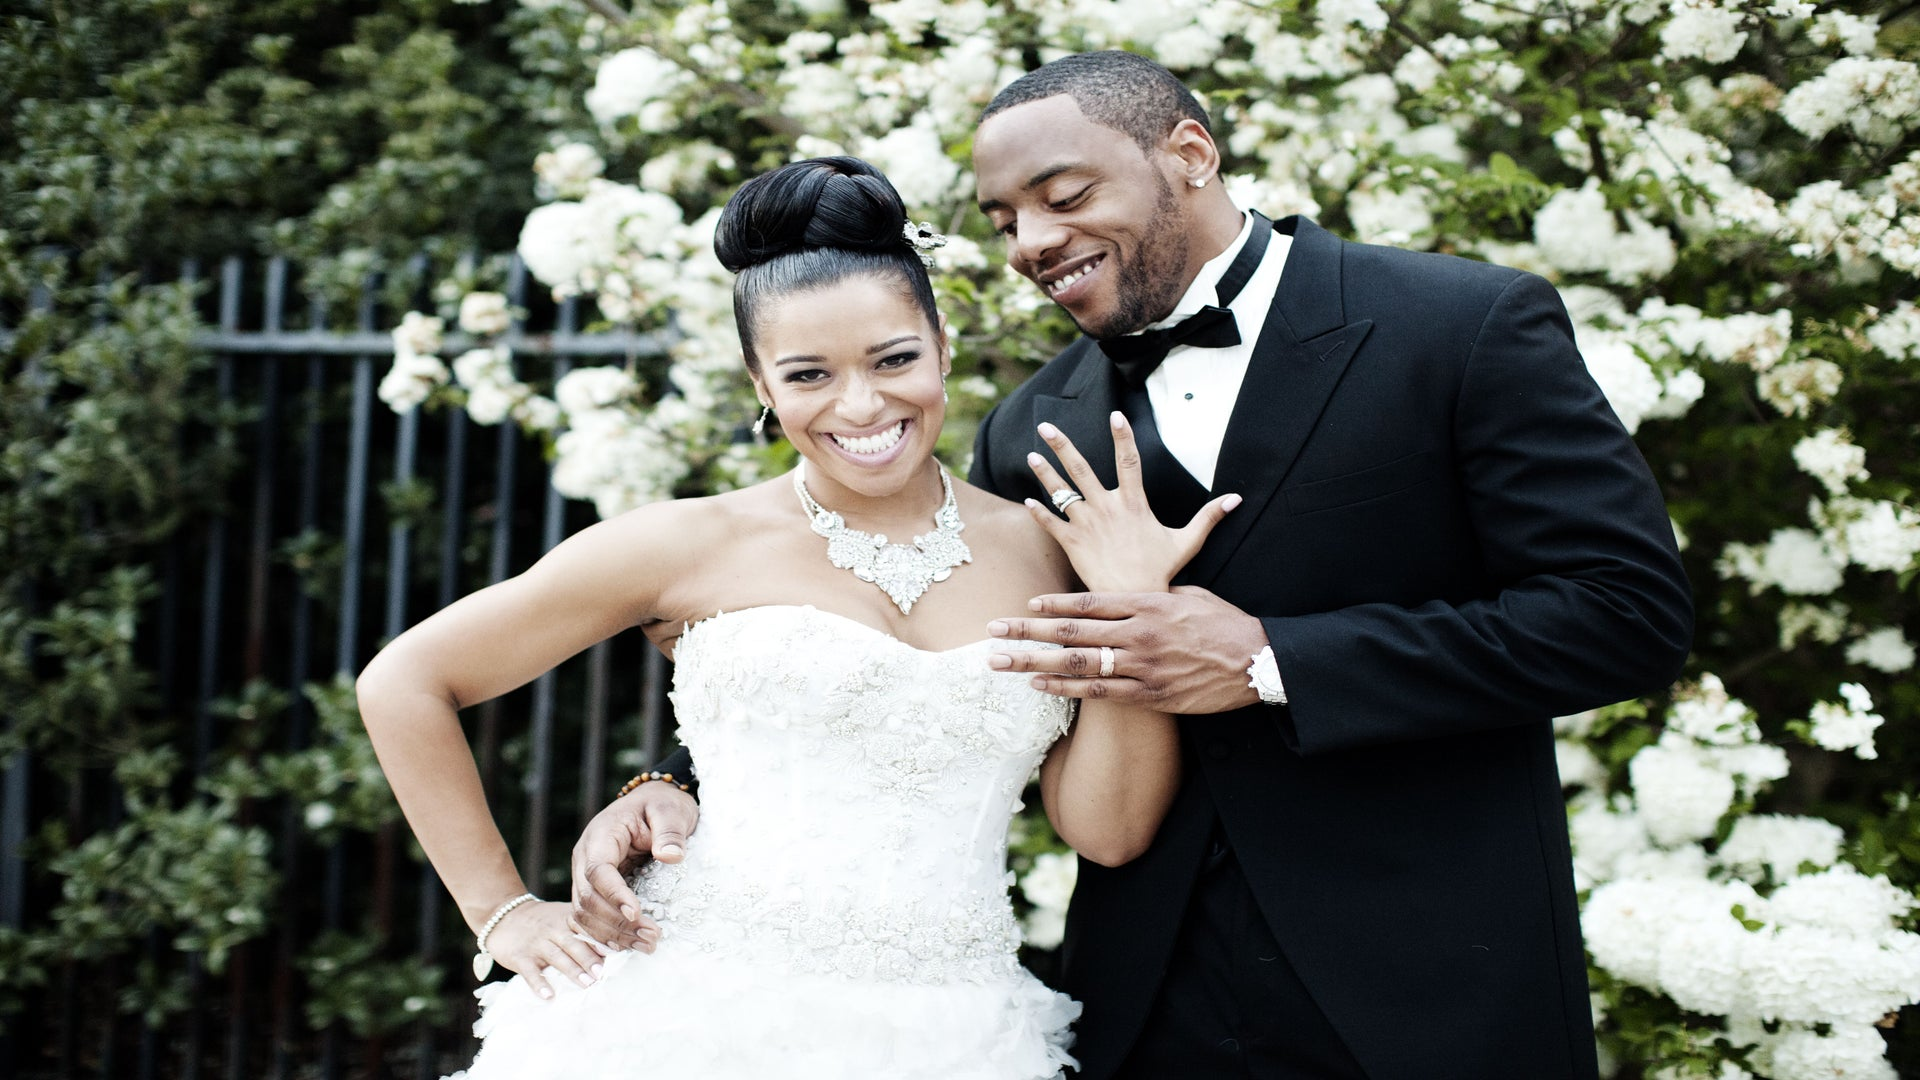 Exclusive: Minnesota Vikings Star Erin Henderson Shares Wedding Photos